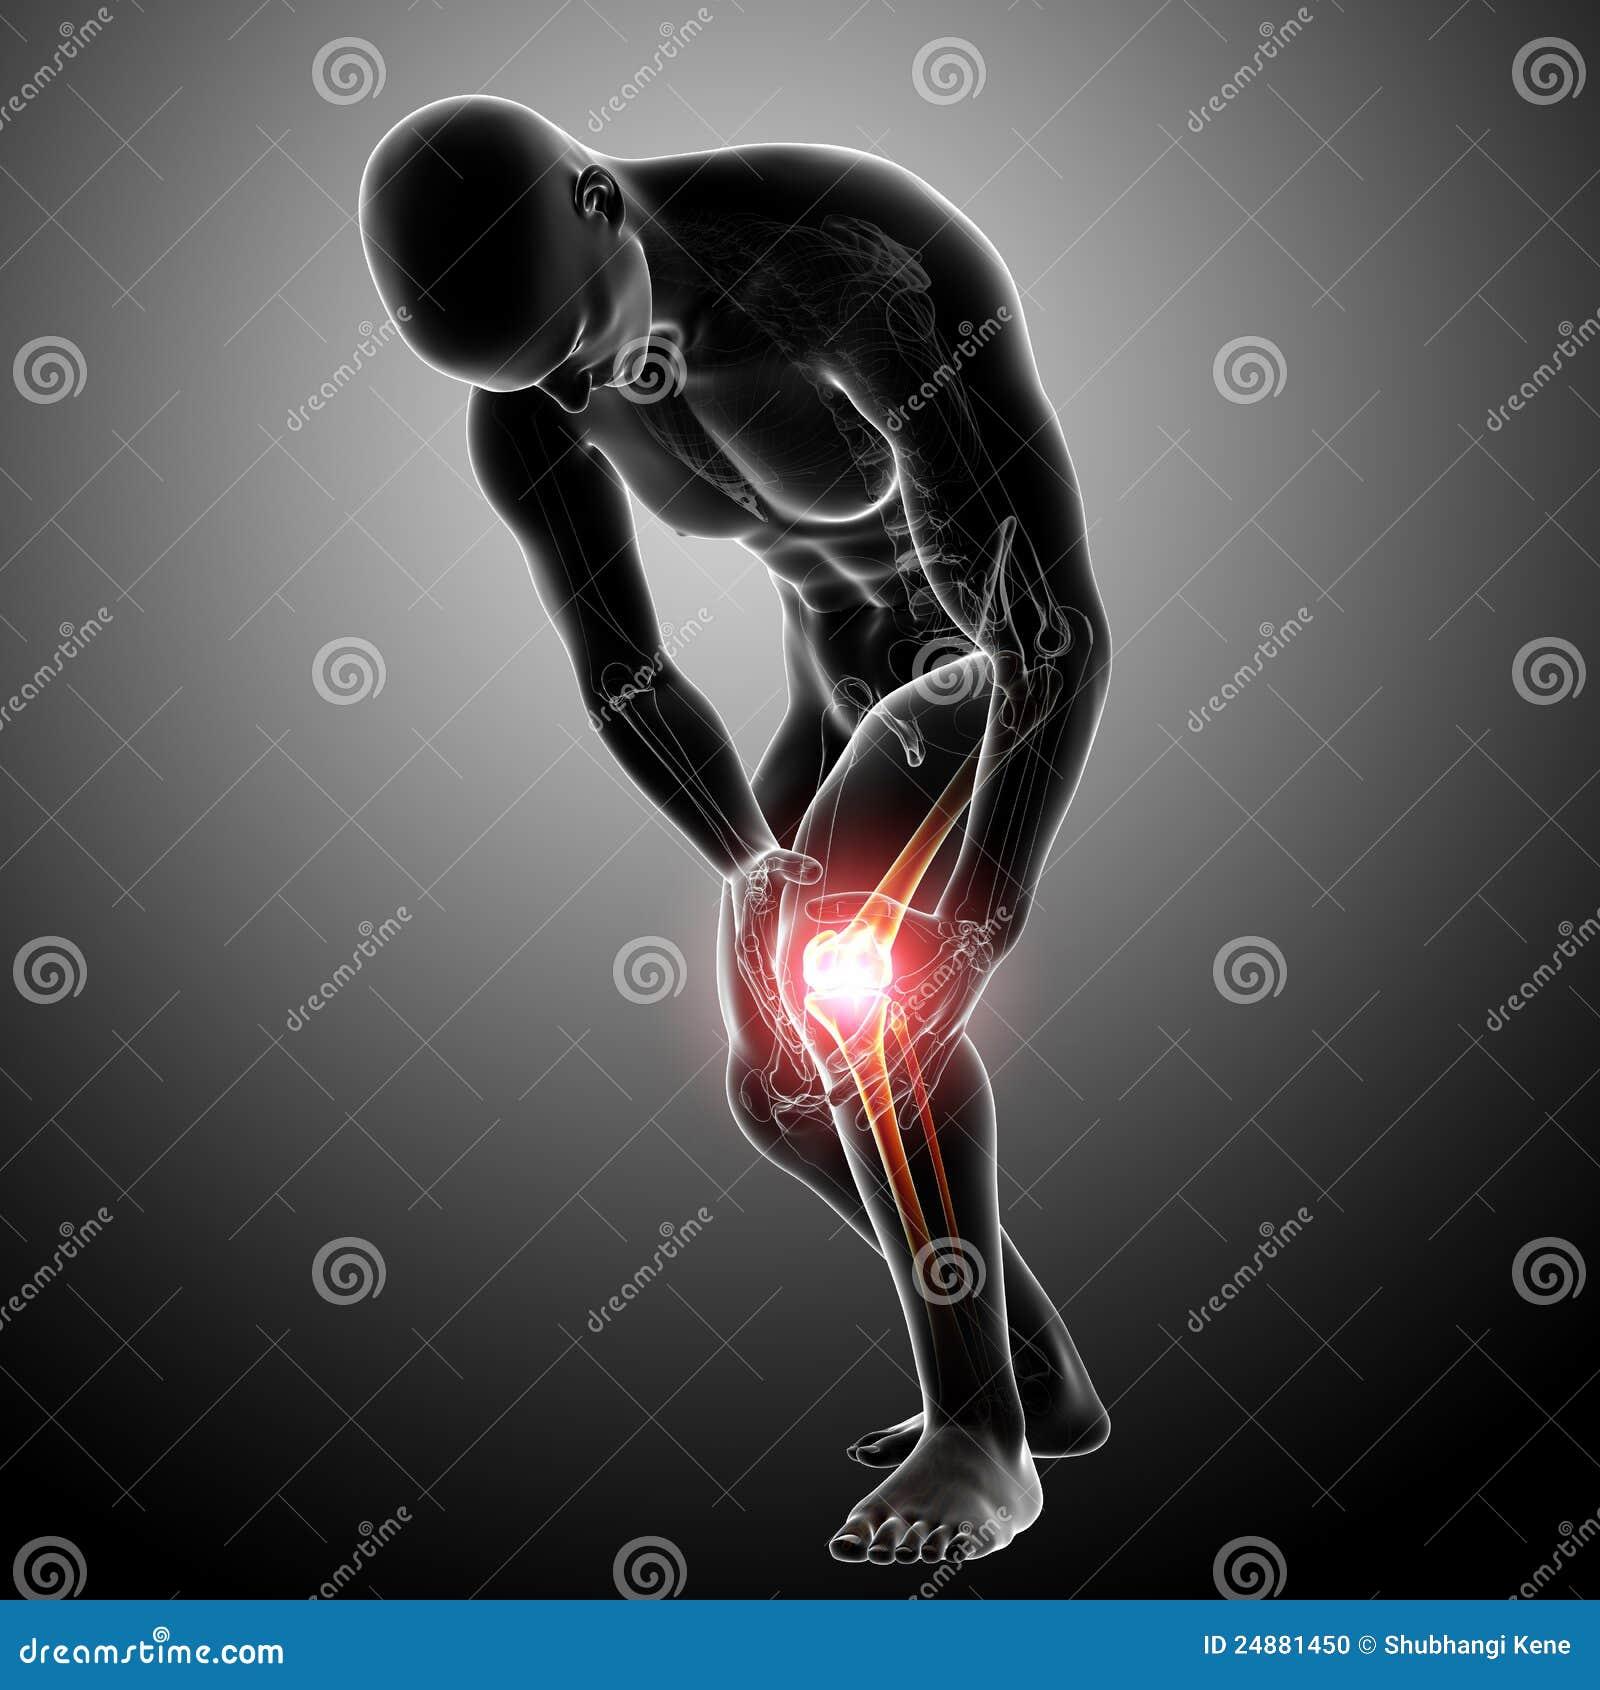 X-ray Anatomy Of Knee Pain Gray Stock Illustration - Illustration of ...